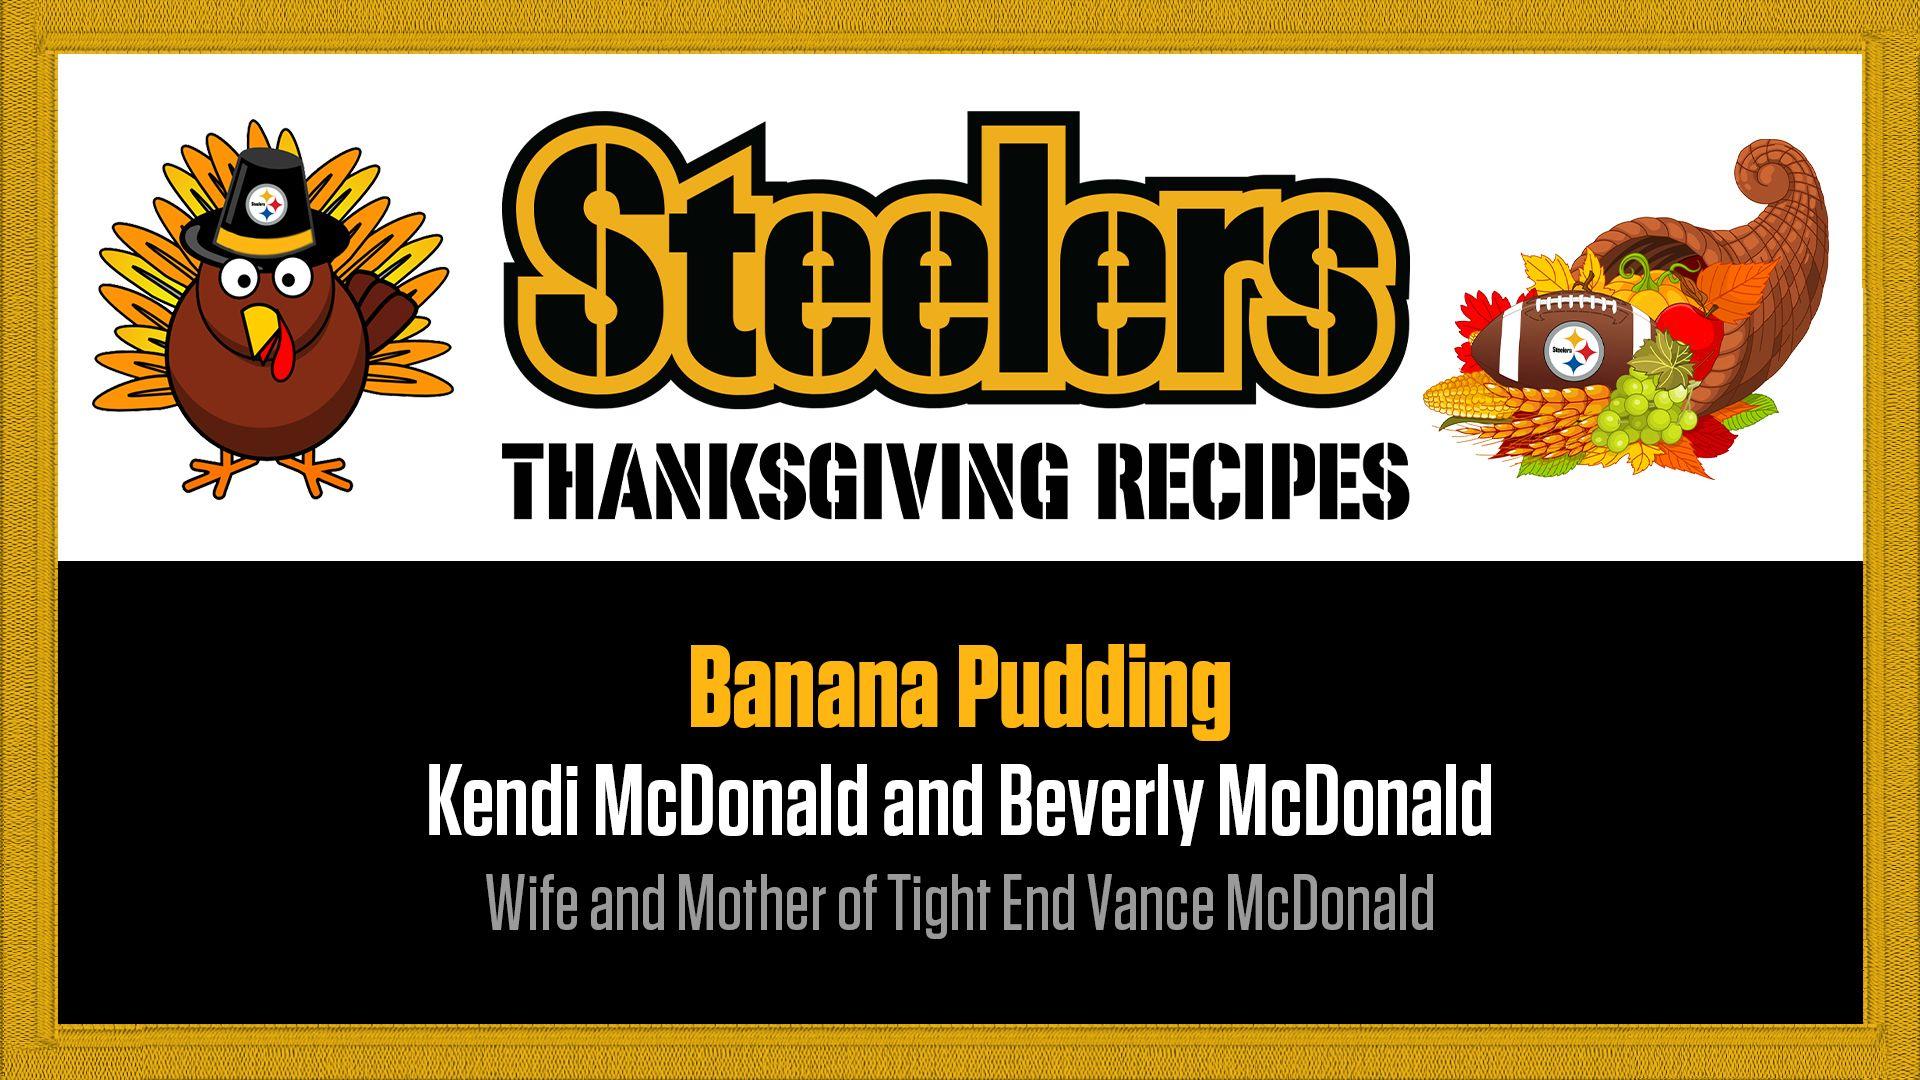 Recipe - banana pudding_the mcdonalds